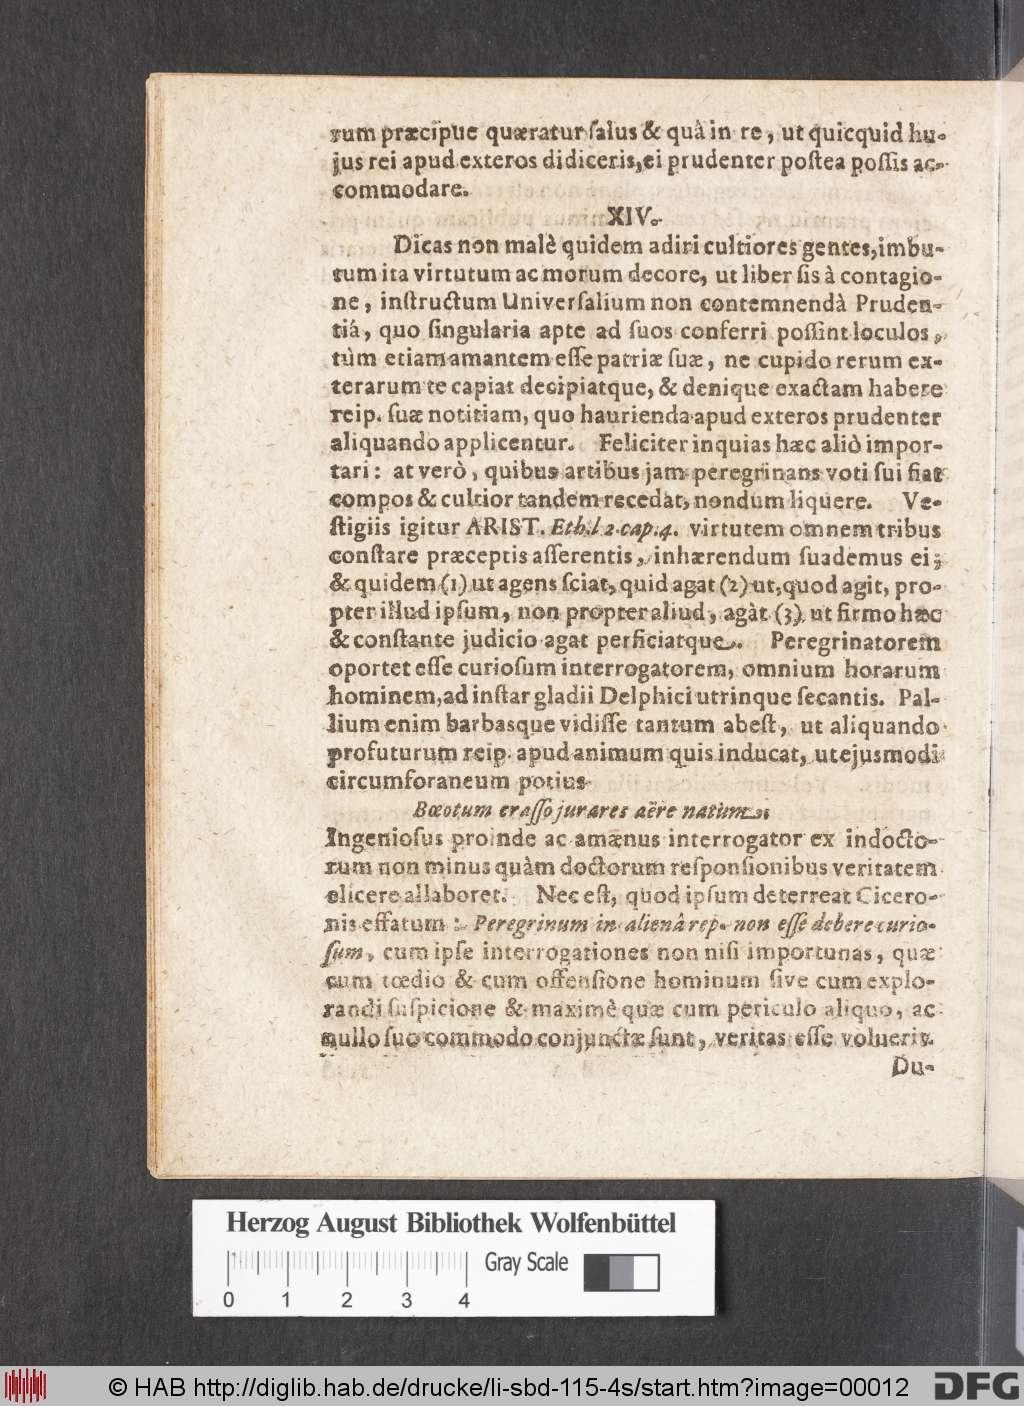 http://diglib.hab.de/drucke/li-sbd-115-4s/00012.jpg